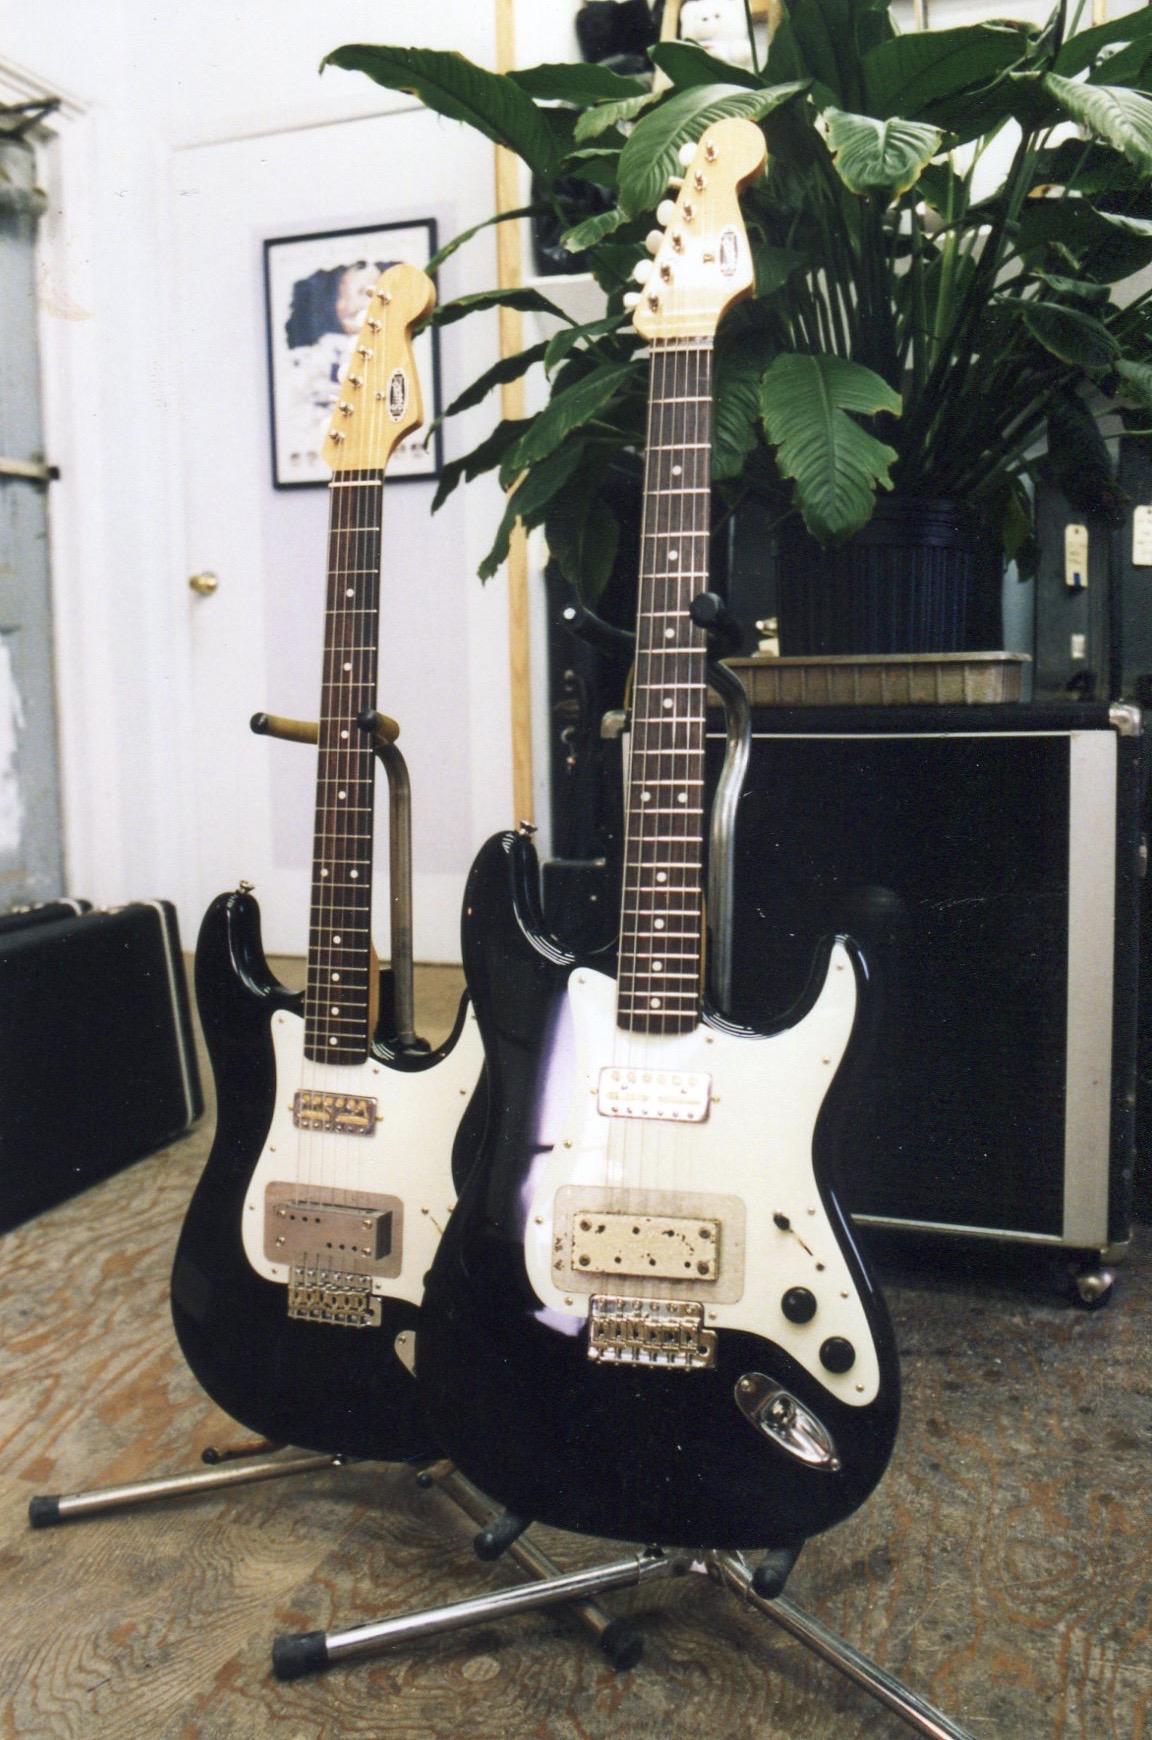 FScipio_1996 Coodercaster Solidbody Electric Guitar Courtesy of Jackson Browne.jpg